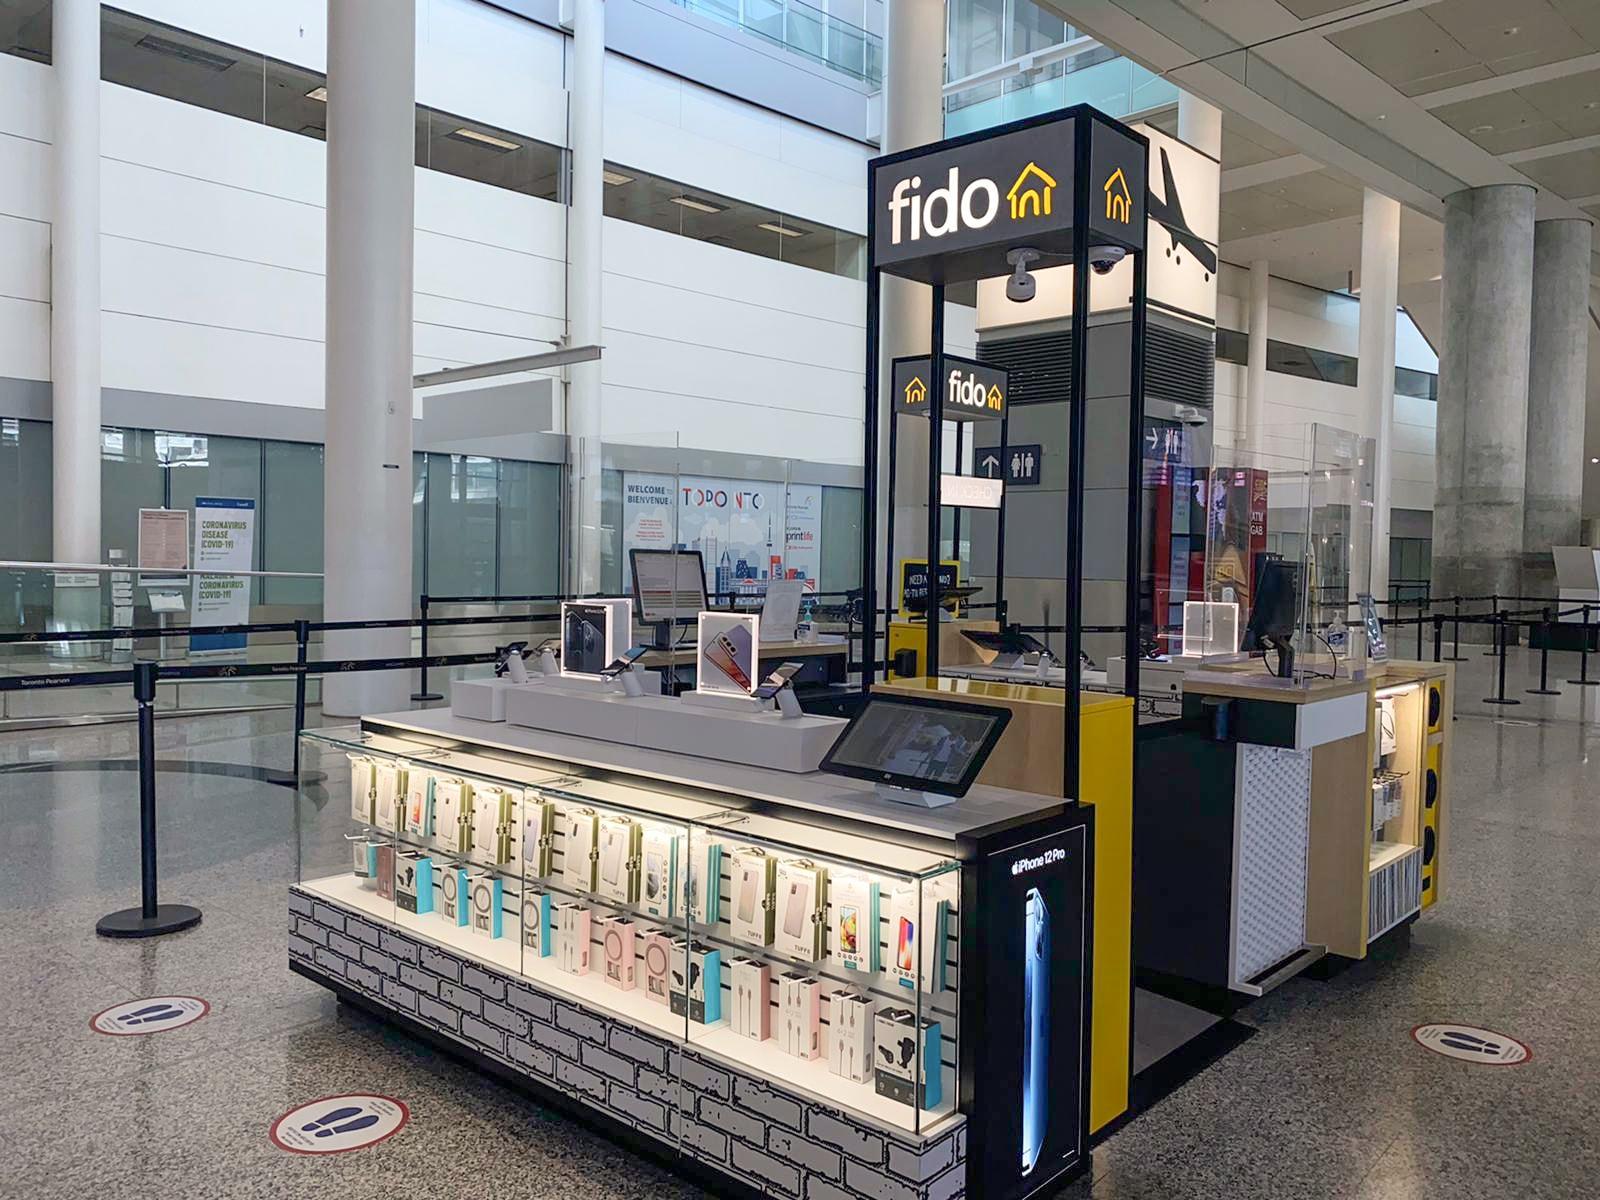 Fido kiosk in Terminal 1, International Arrivals